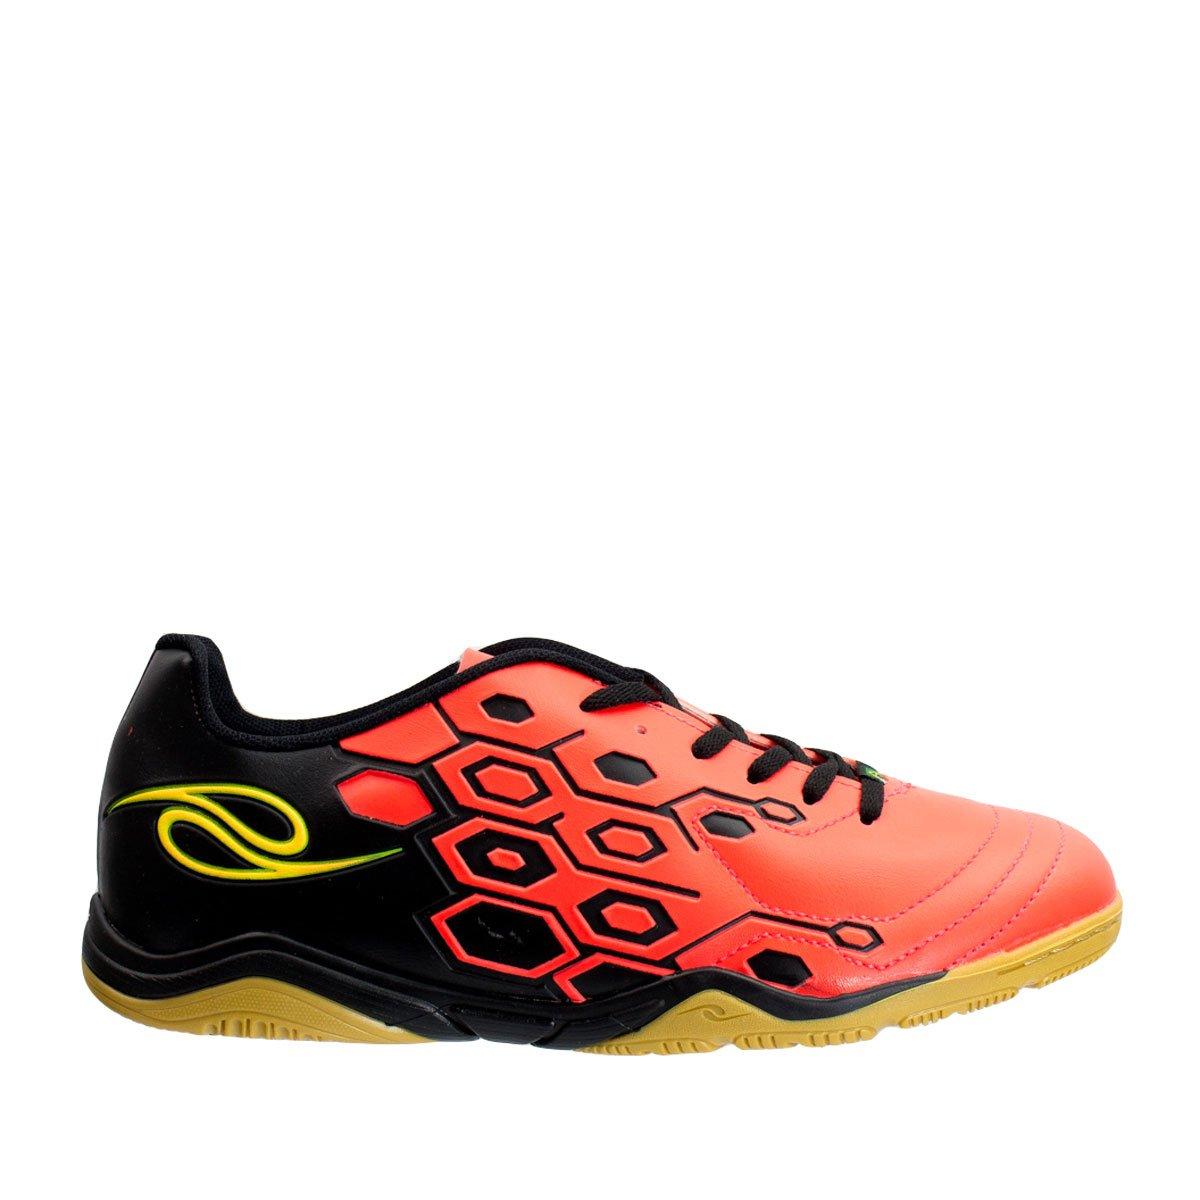 b4af9c13799f3 Bizz Store - Chuteira Futsal Masculina Dalponte Cyber Indoor